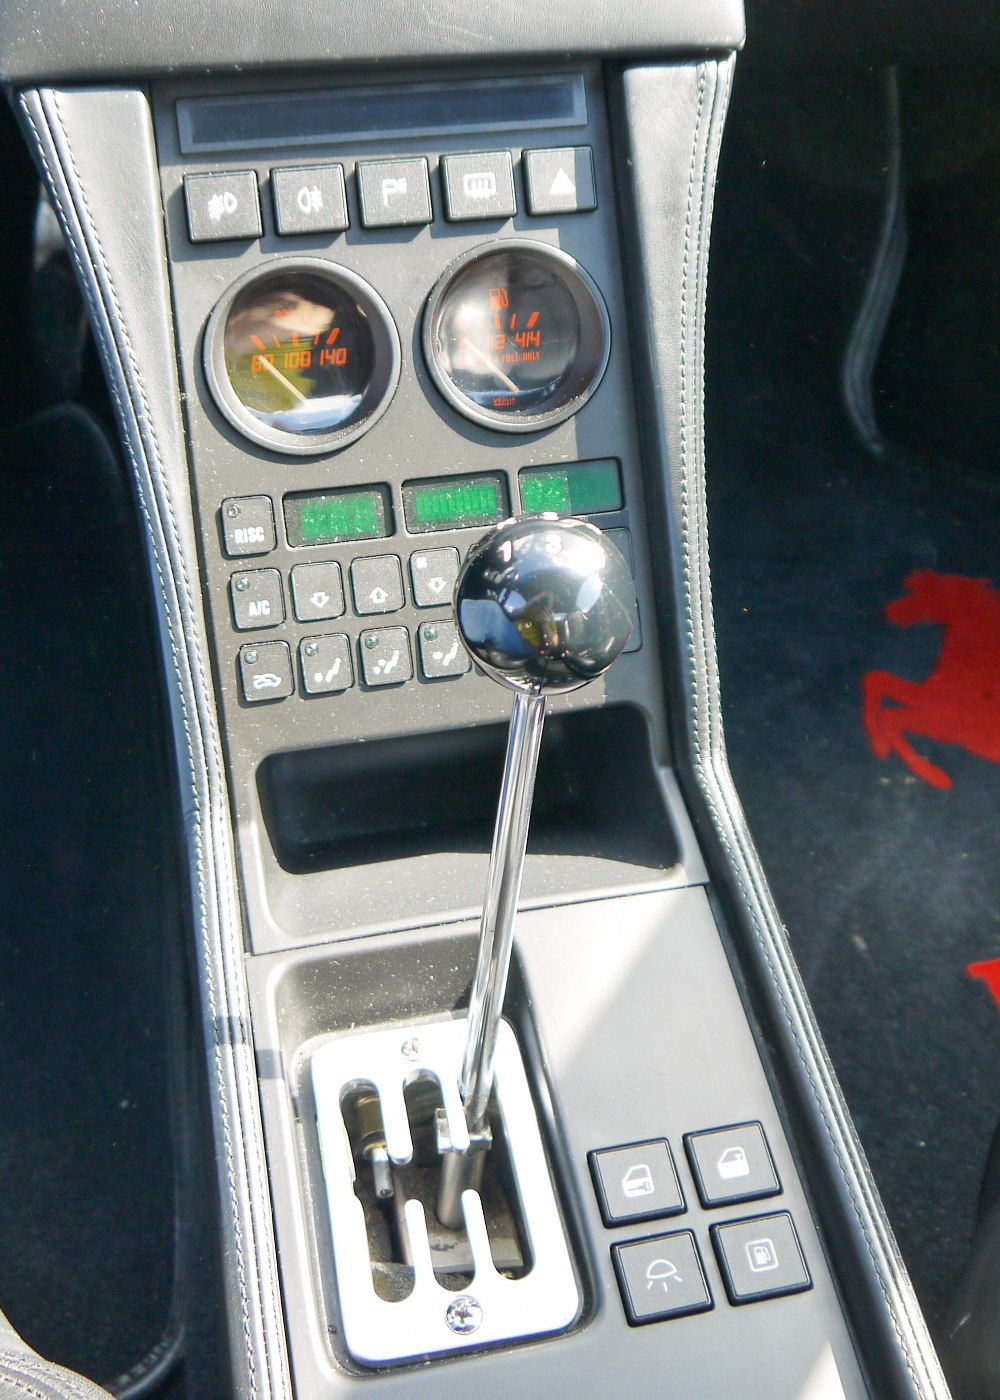 1993 FERRARI 348 TRASVERSALE BERLINETTA Registration Number: L796THC Chassis Number: - Image 46 of 49